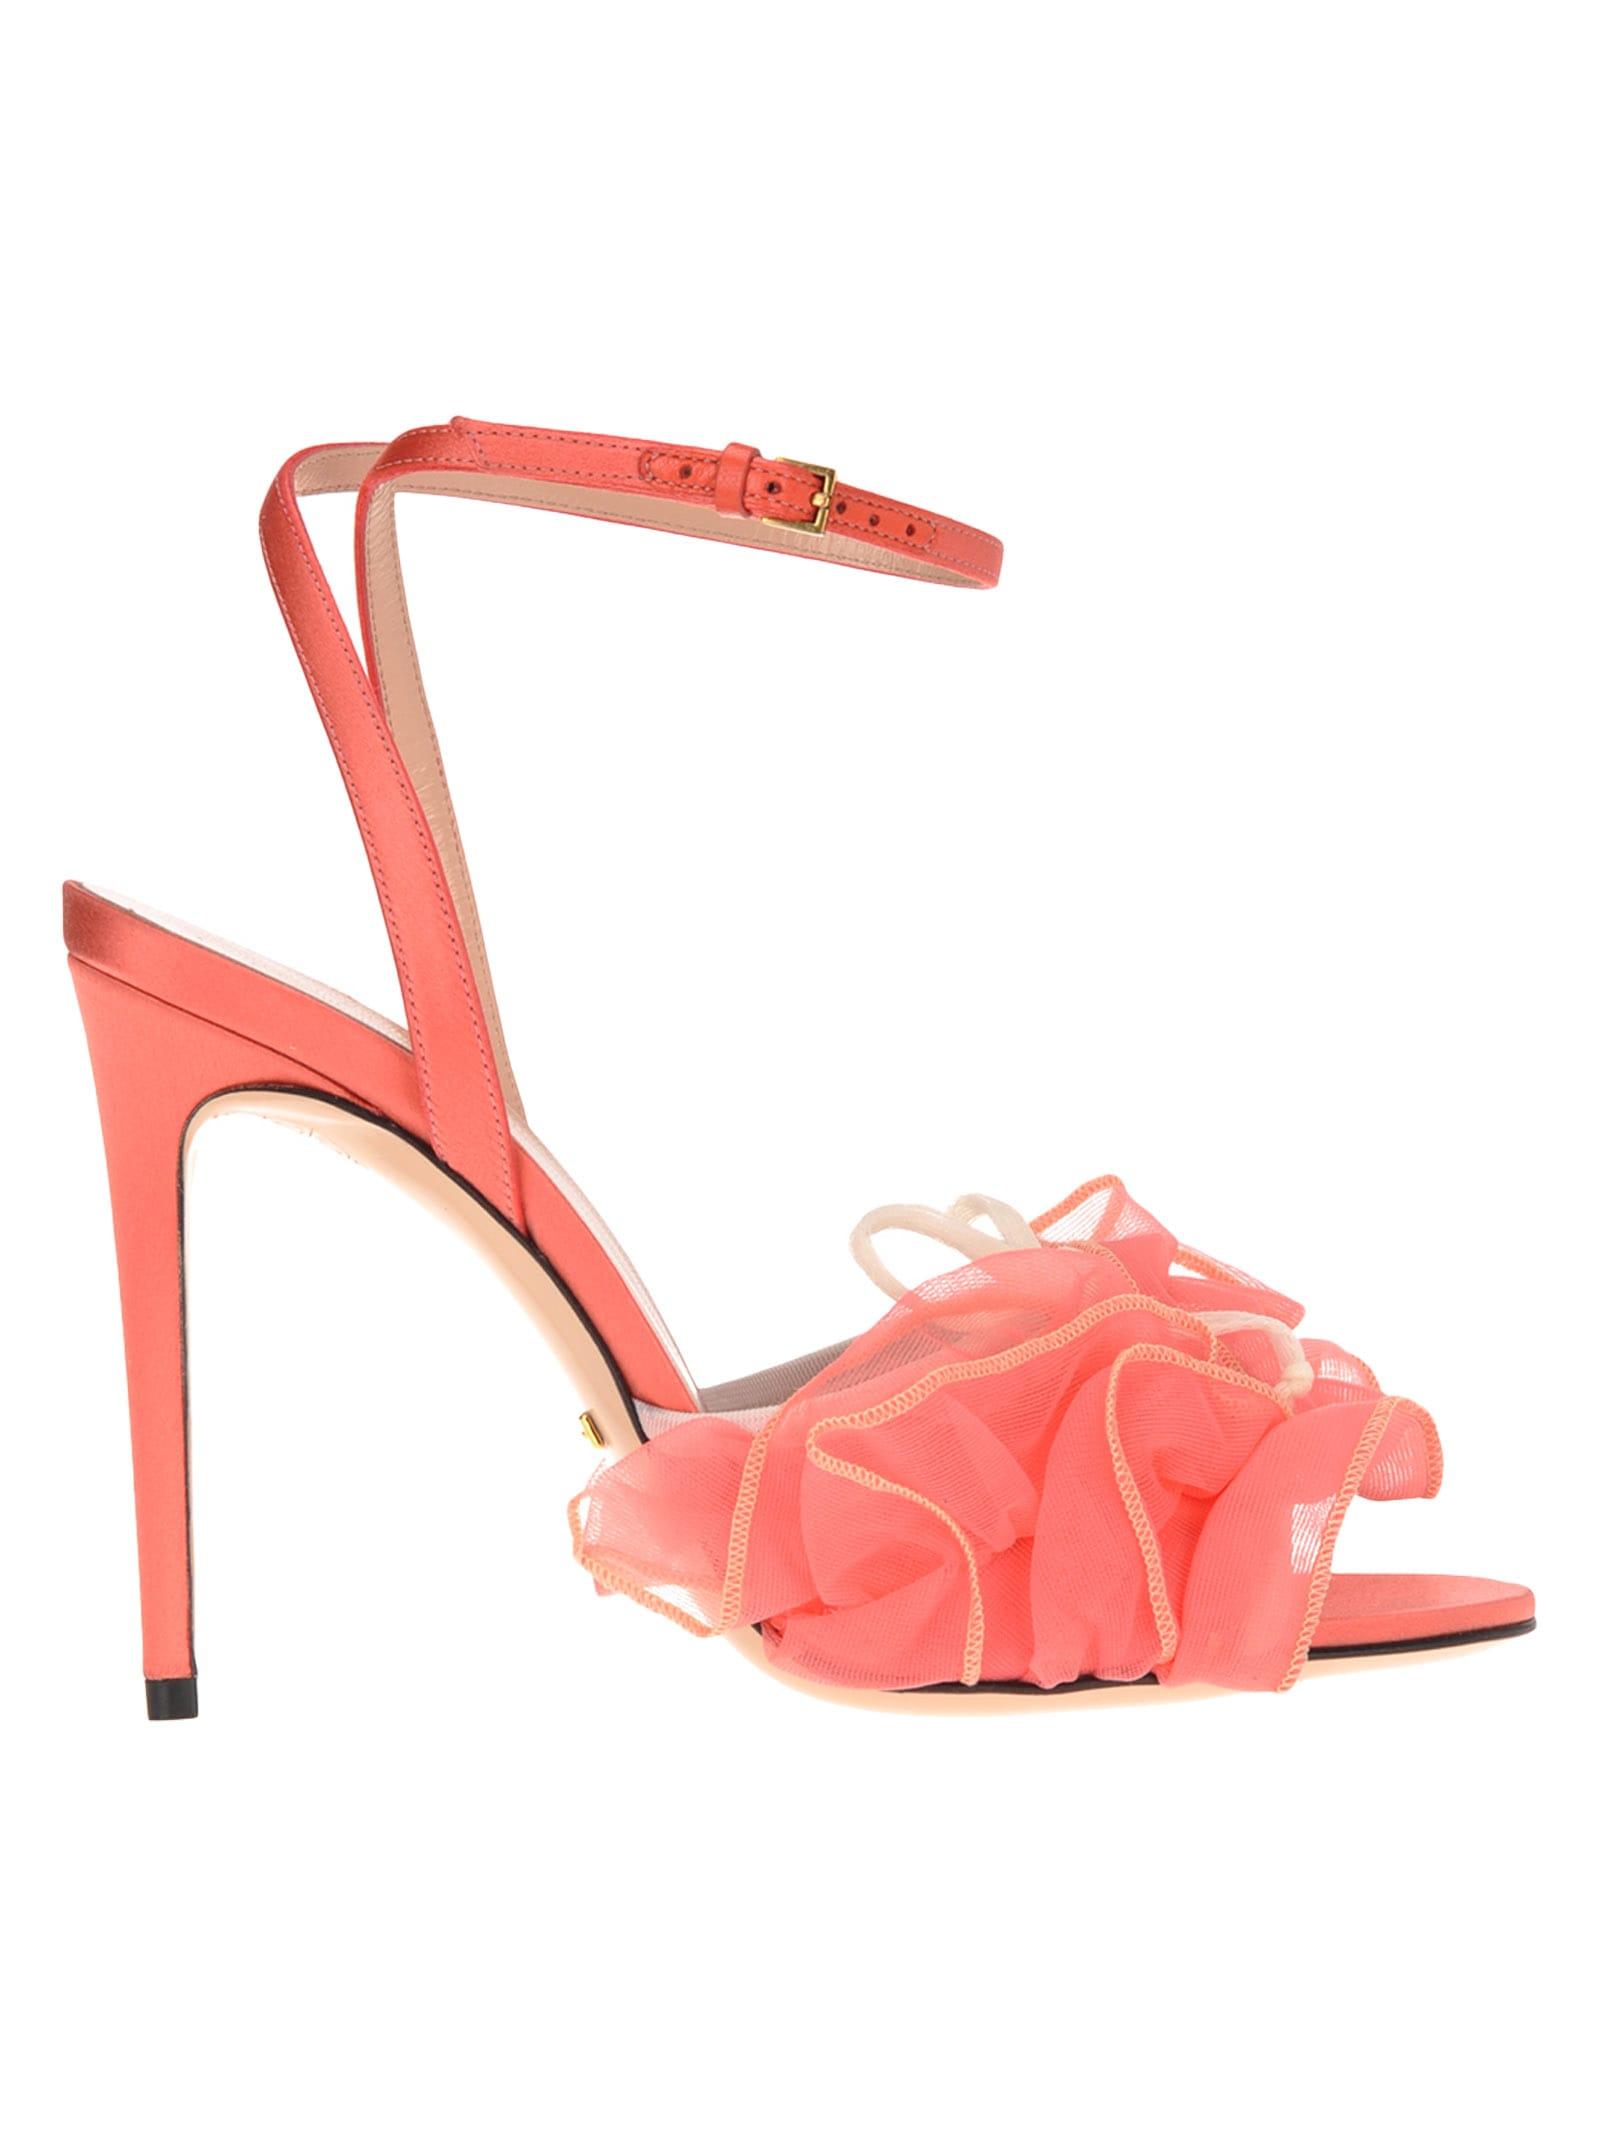 Gucci Gucci Tulle Sandals